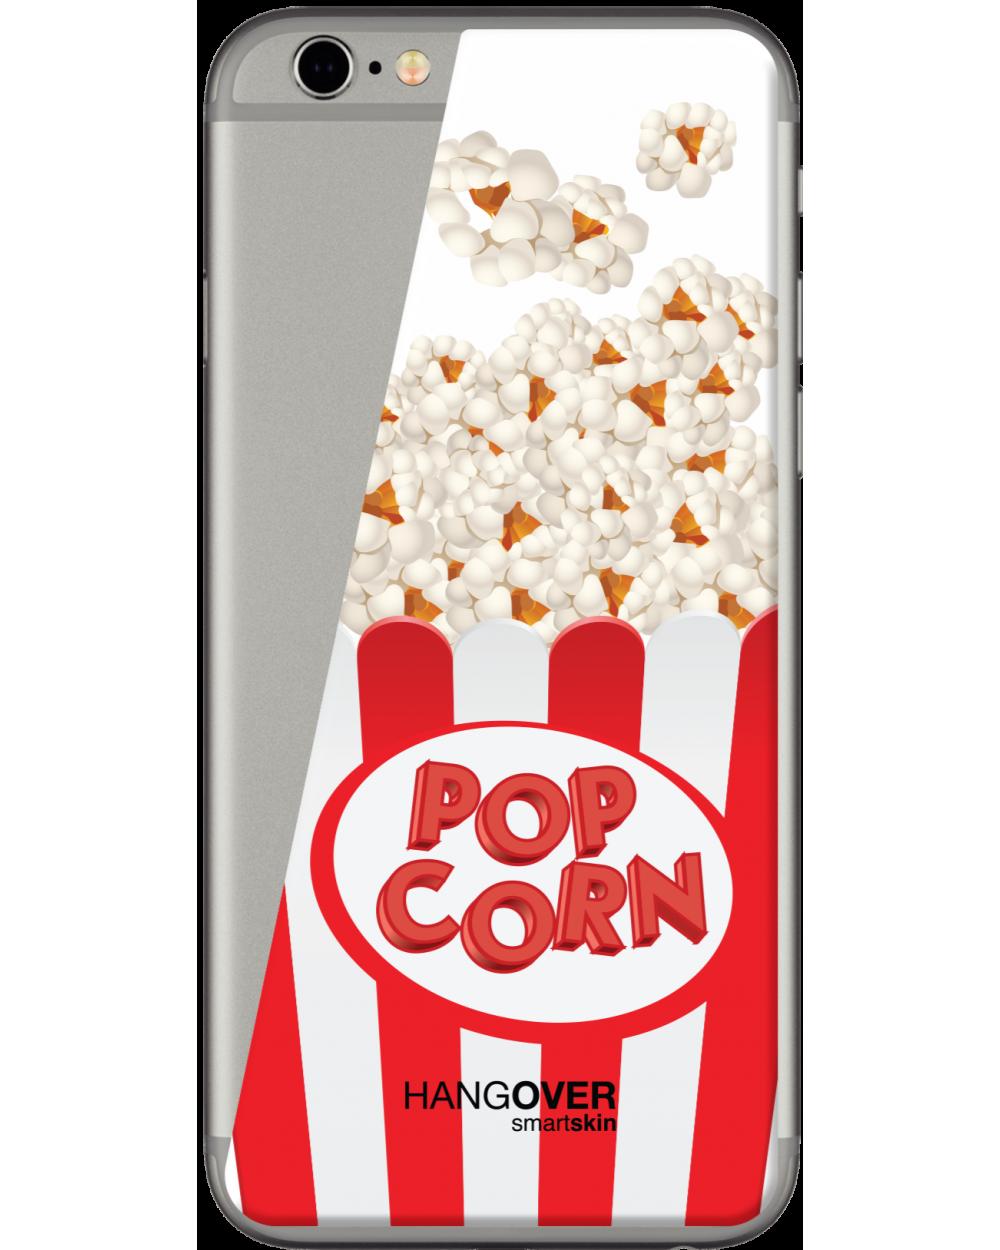 Yummi Gallery - Popcorn